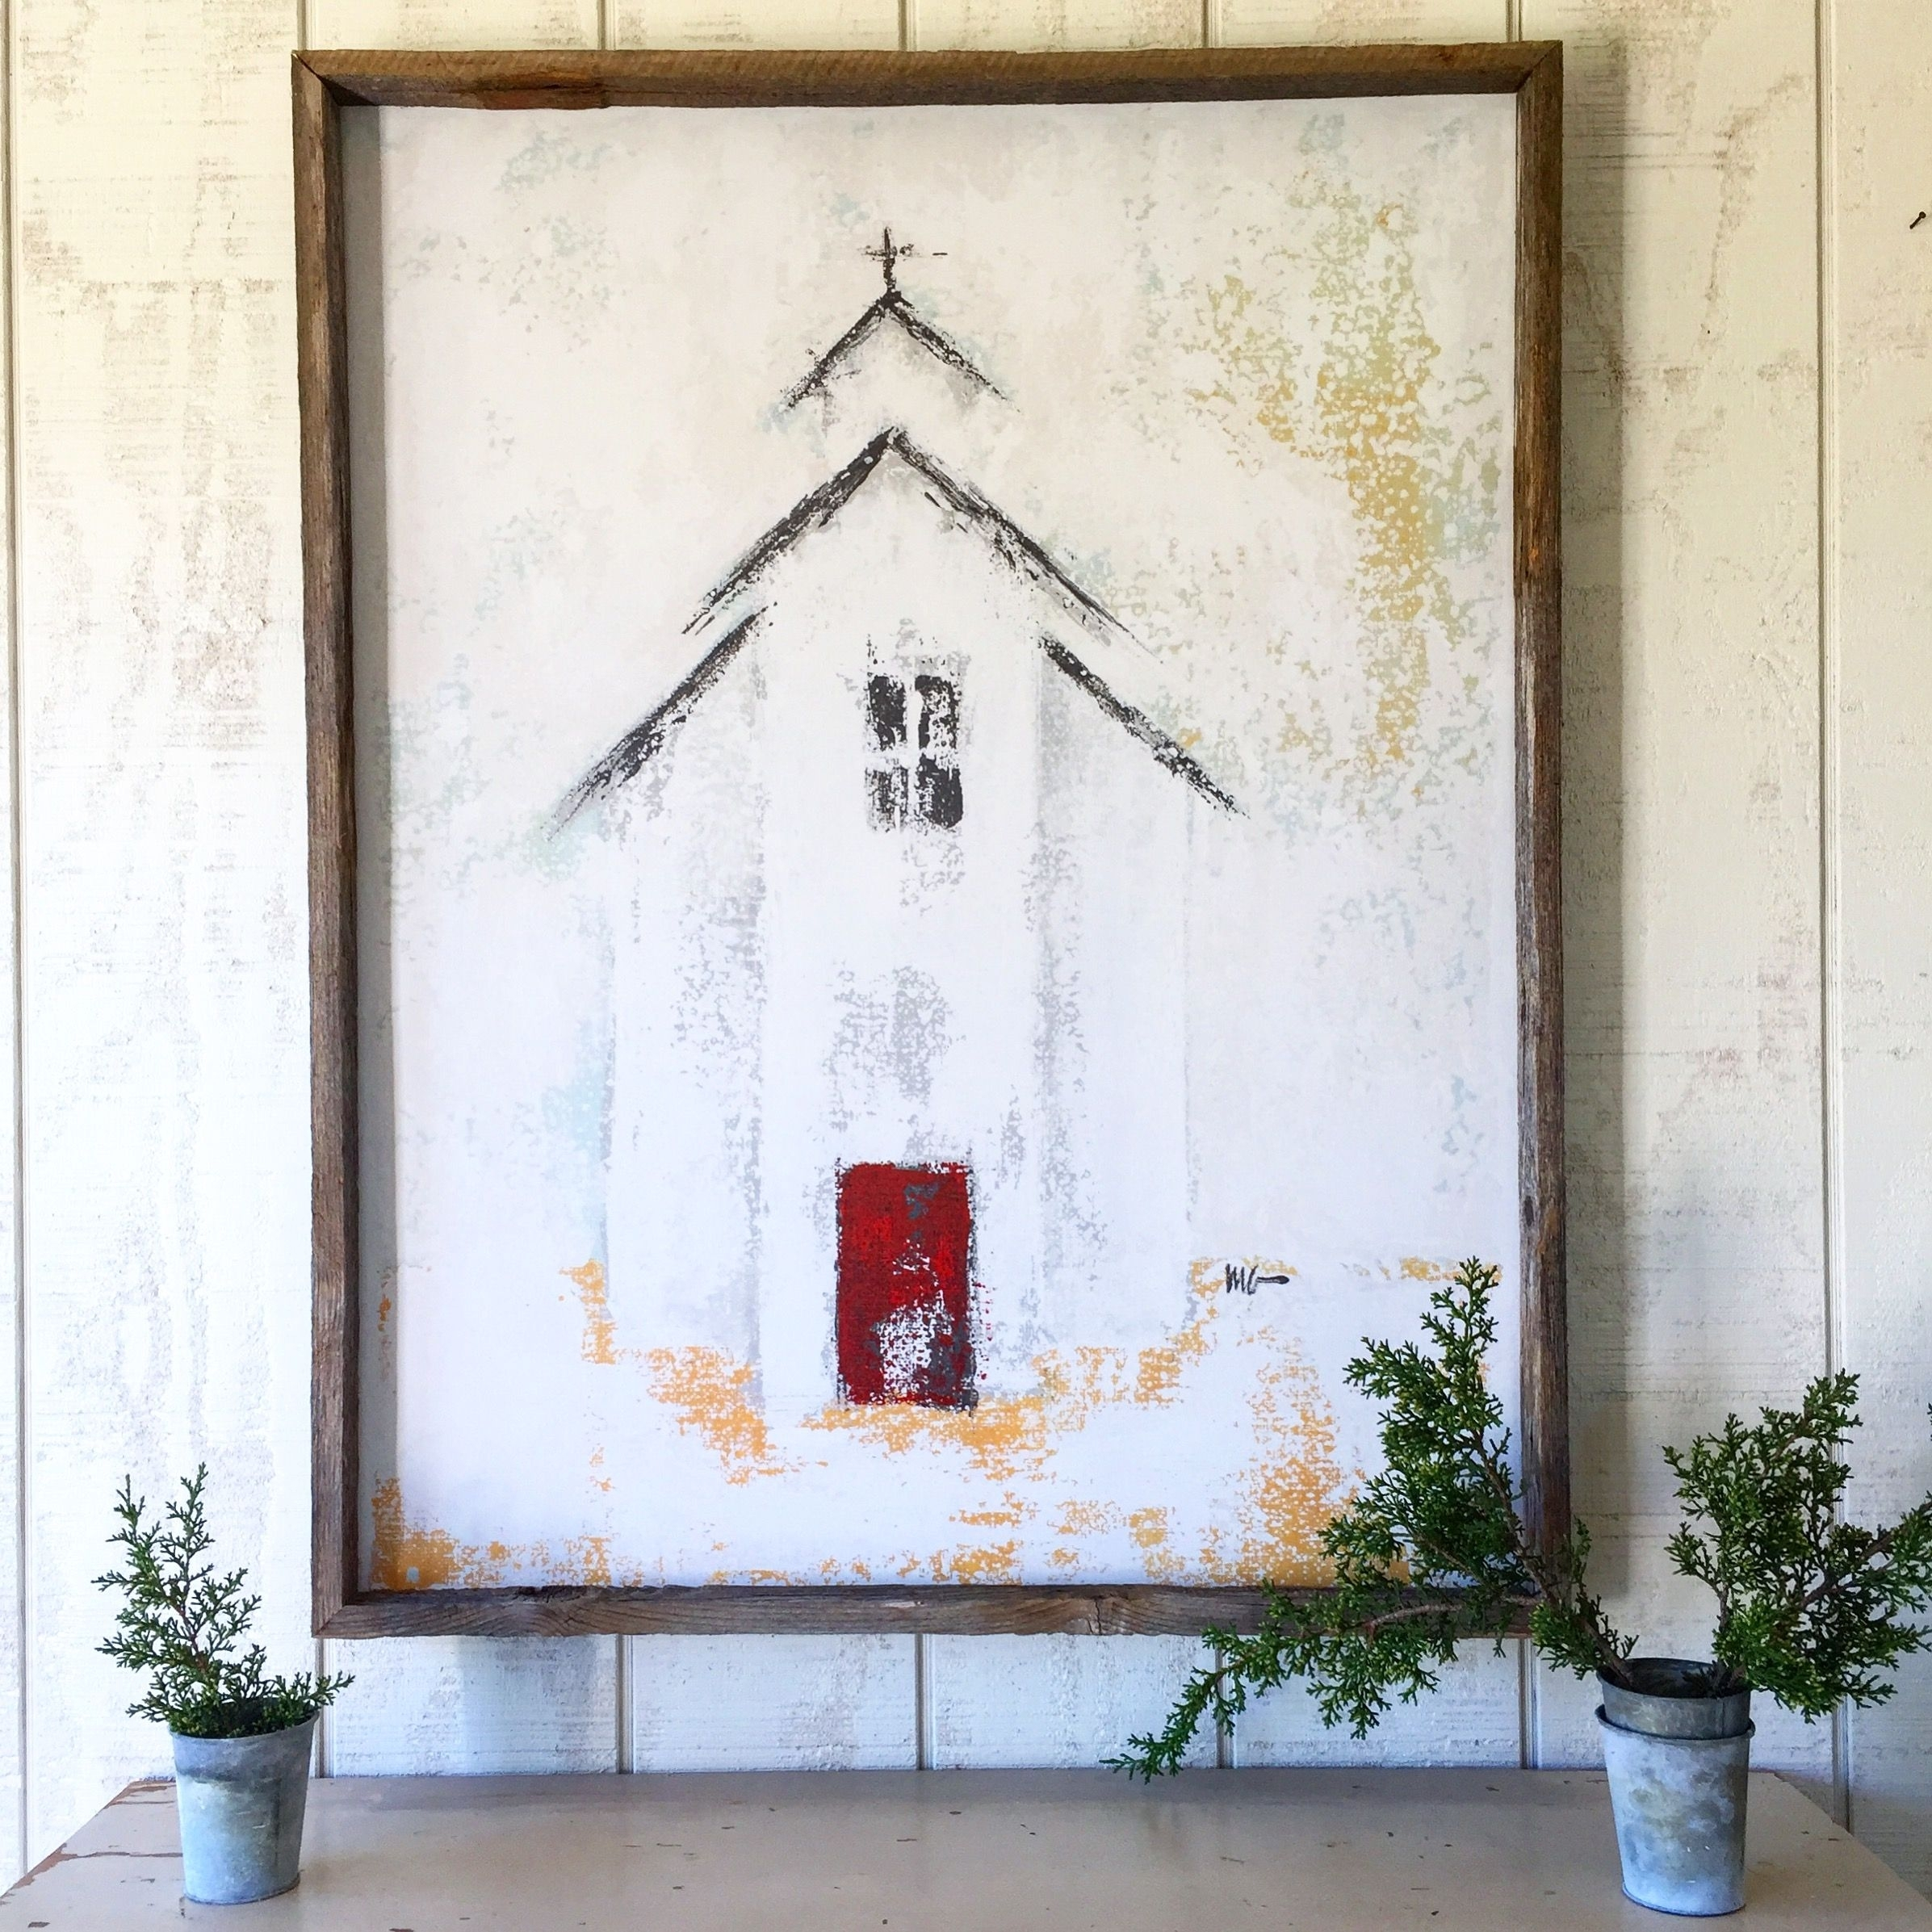 Christmas Church Framed Print | Den | Pinterest | Churches Regarding Current Christmas Framed Art Prints (Gallery 9 of 15)